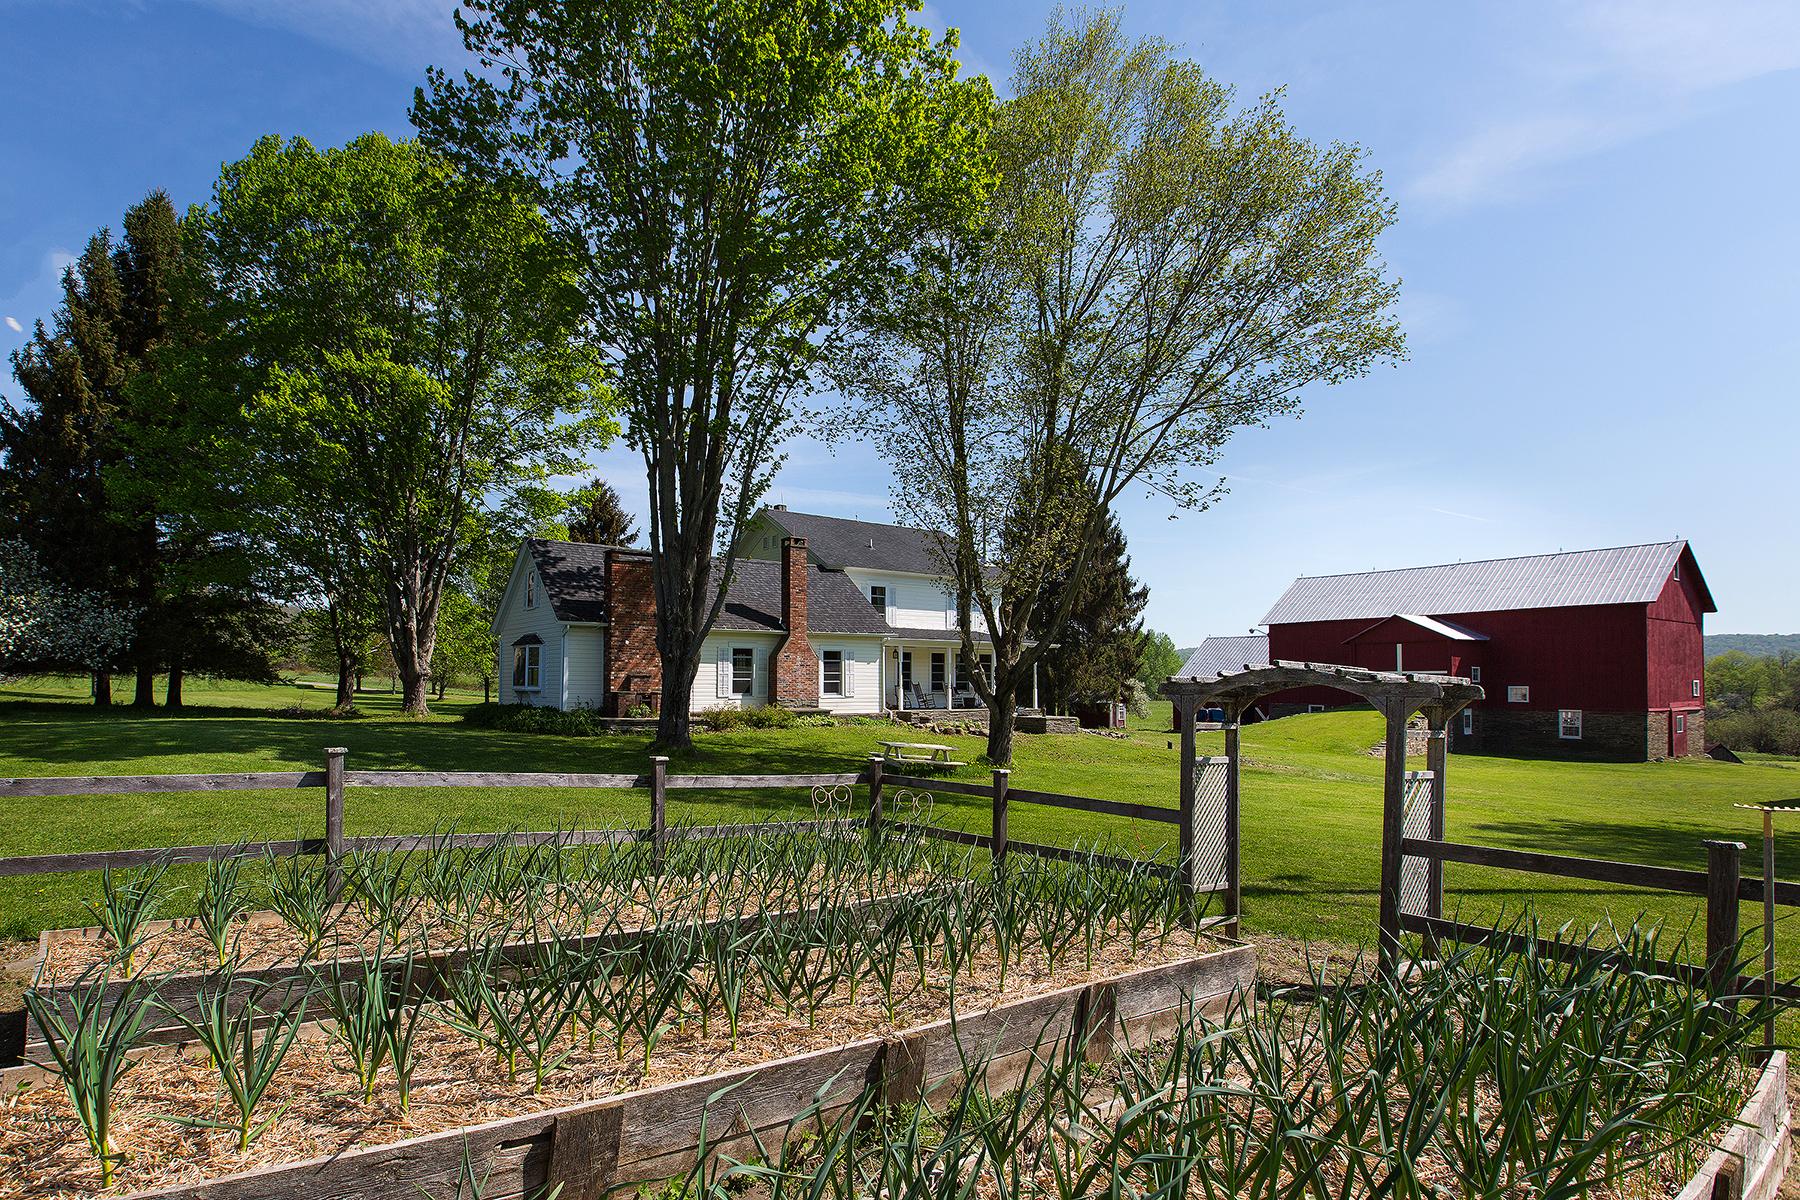 Single Family Home for Sale at Hemlock Hill Farm 380 Raymond Fish Rd Hartwick, New York 13348 United States